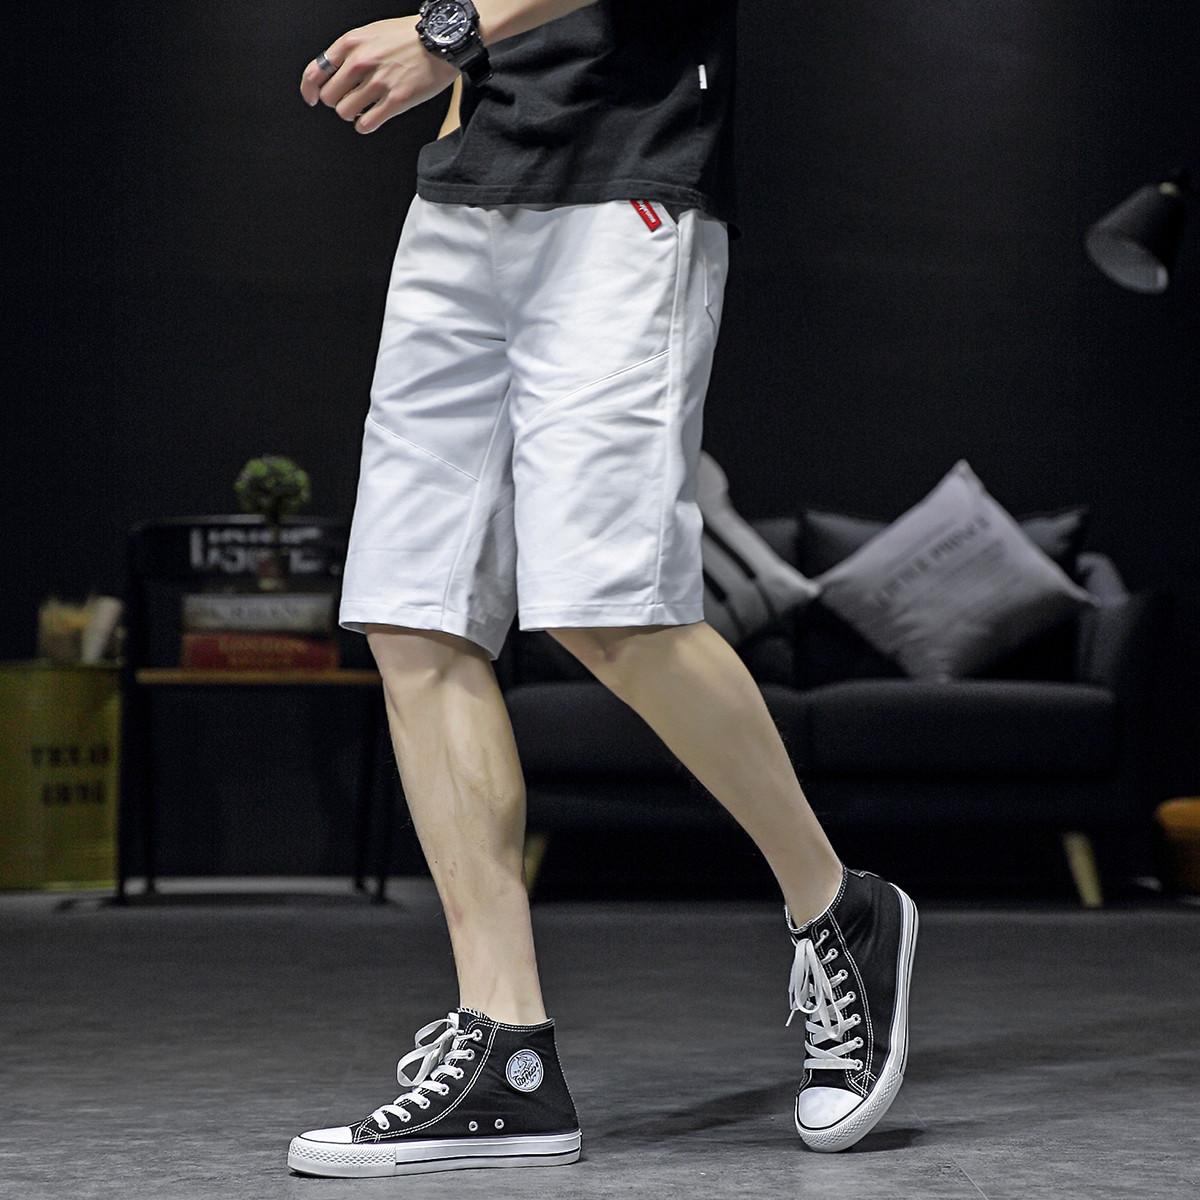 SARTORE男士短裤夏季新款休闲运动裤宽松直筒裤潮流男式五分裤子男MLS-19184